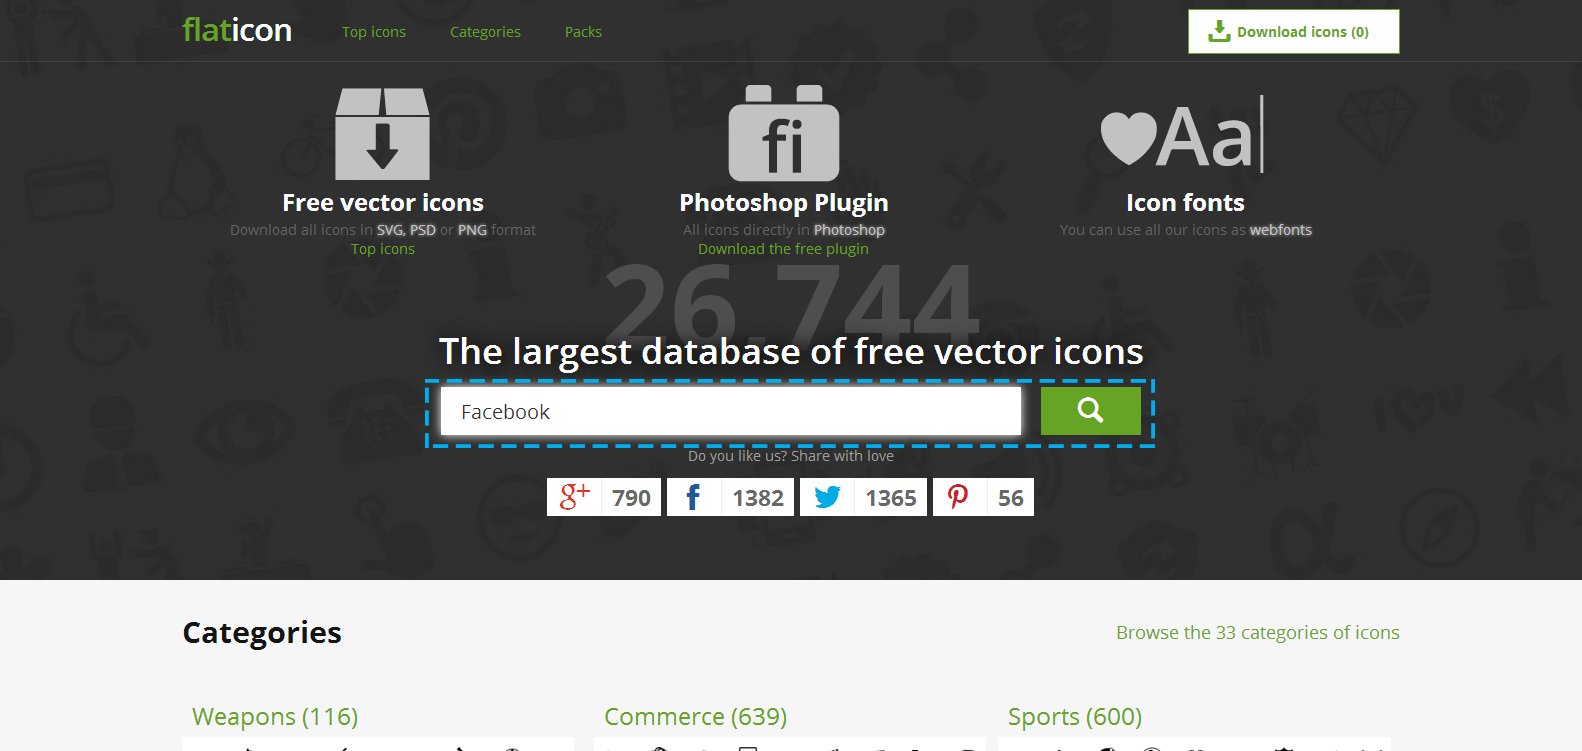 How to get social media icons in photoshop bijutoha photoshop plugin buycottarizona Choice Image